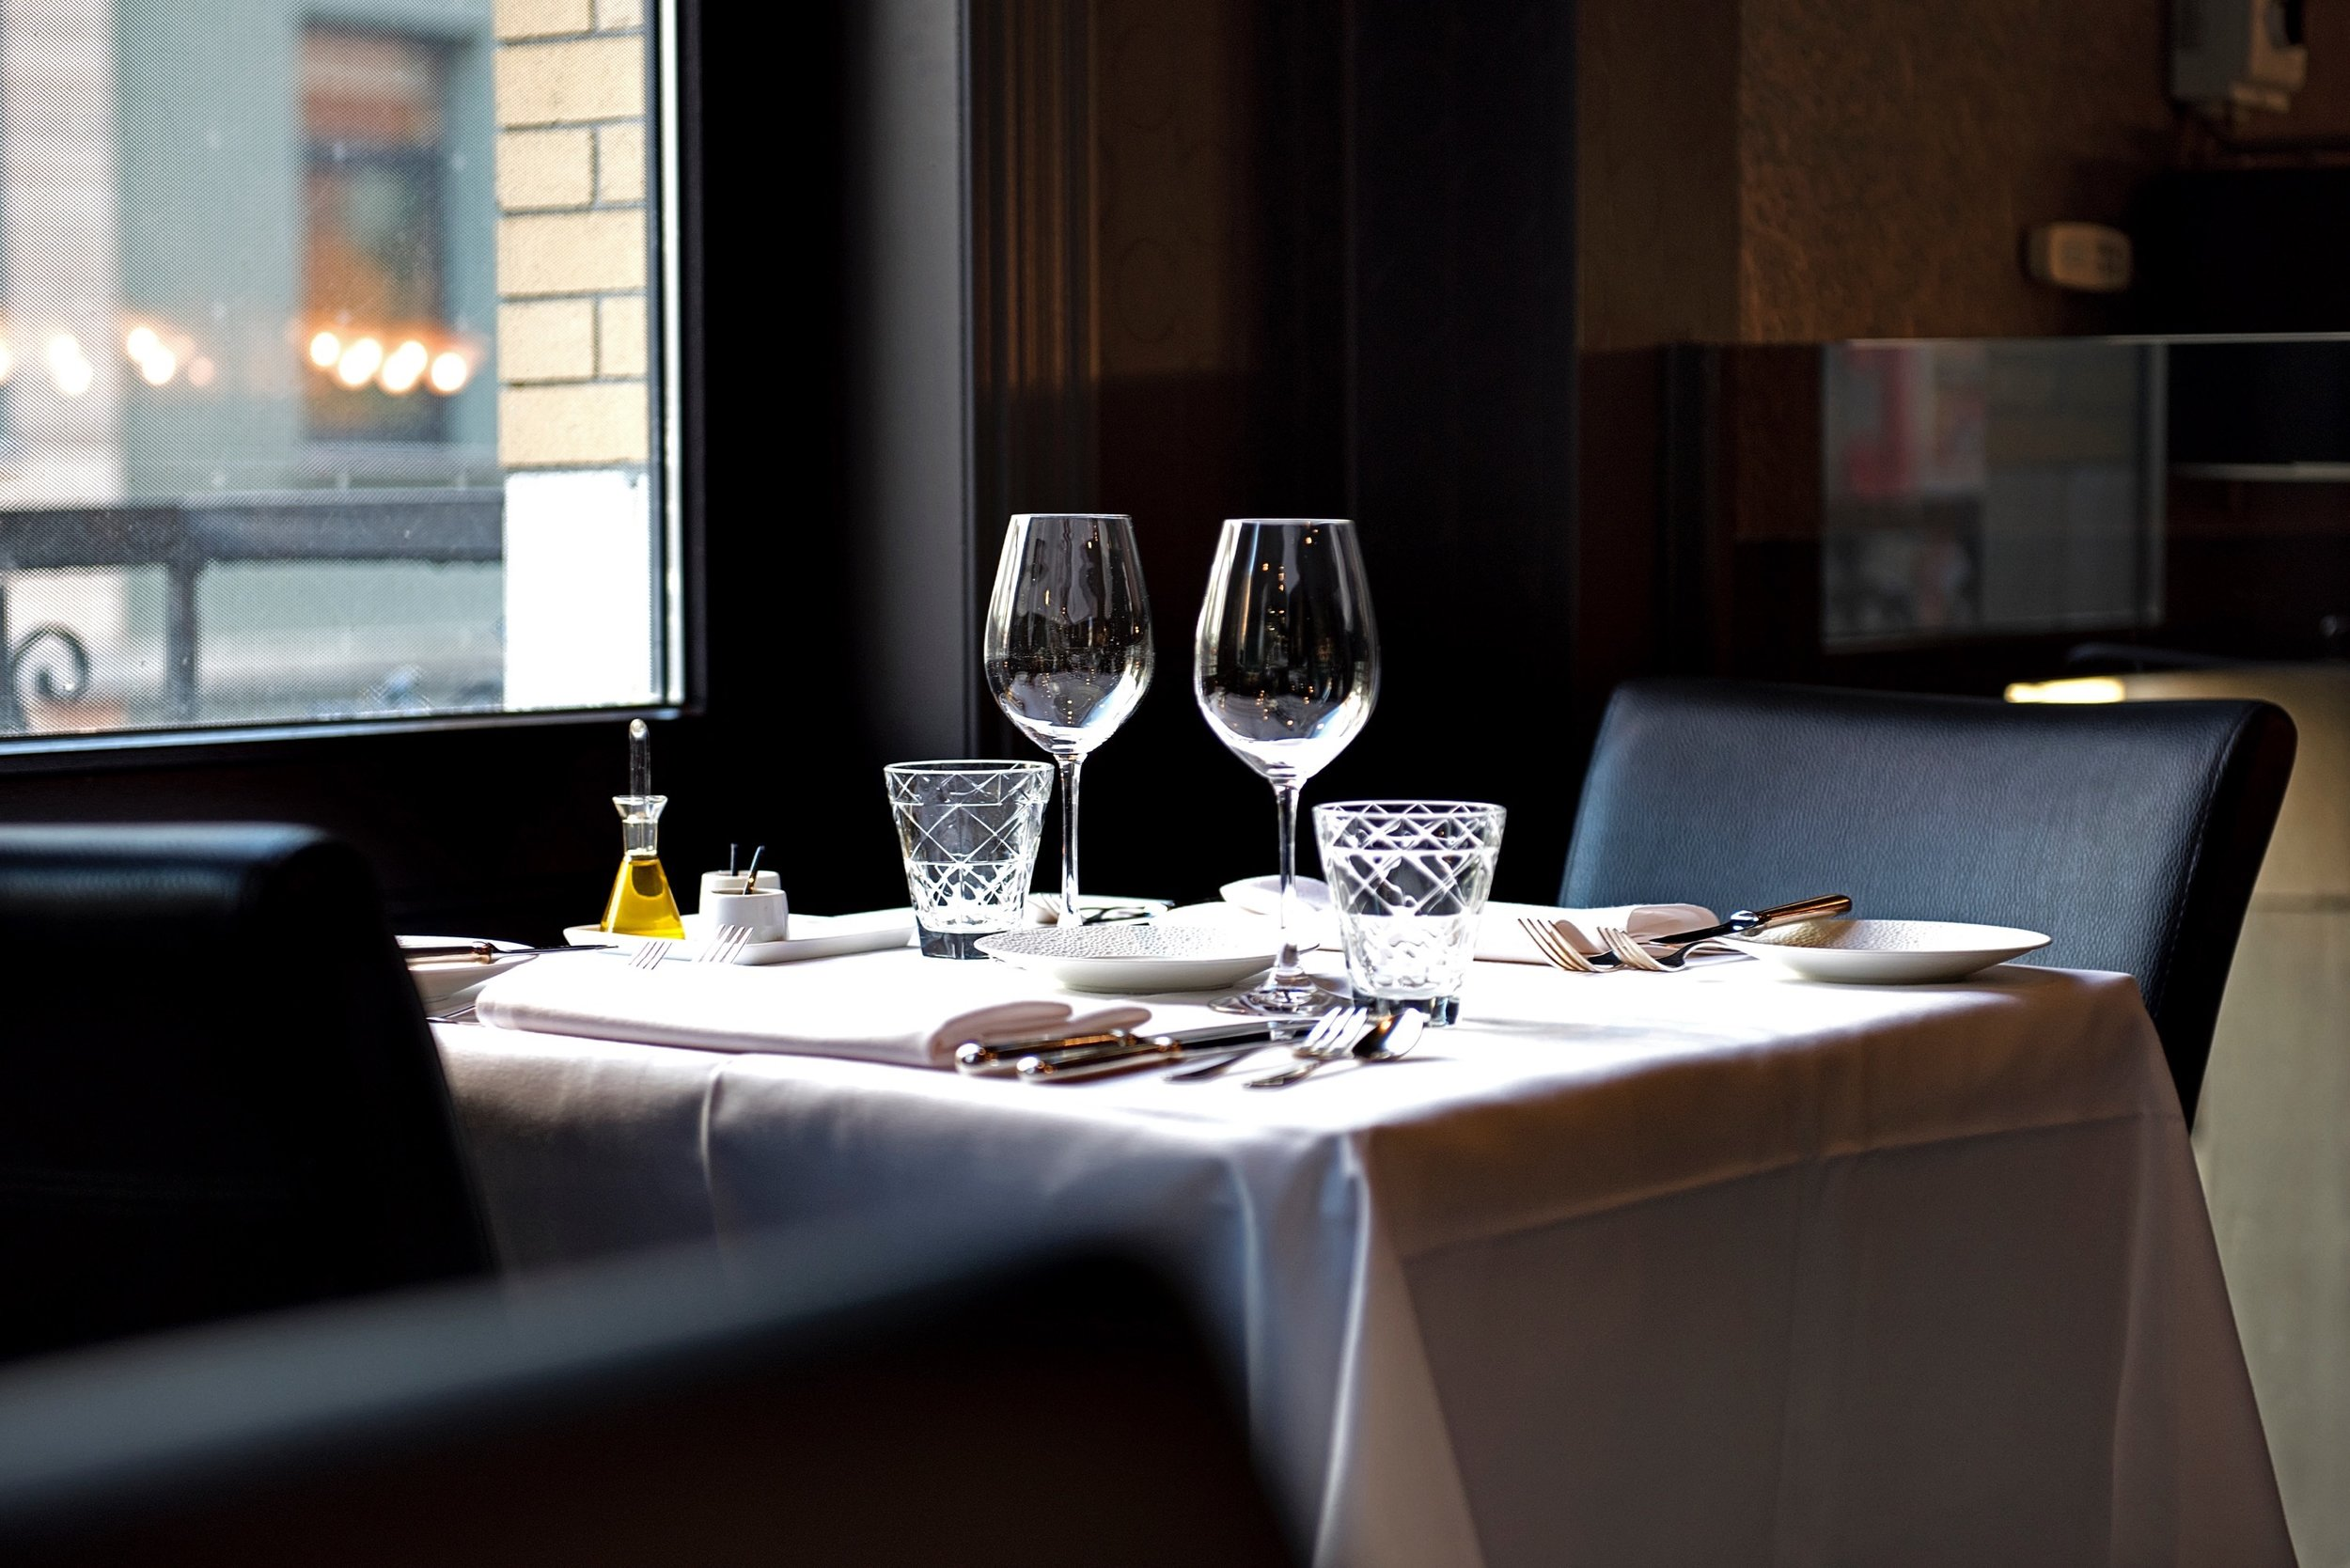 6 michelin restaurant the glorious antwerpen tablefever bart albrecht.jpg